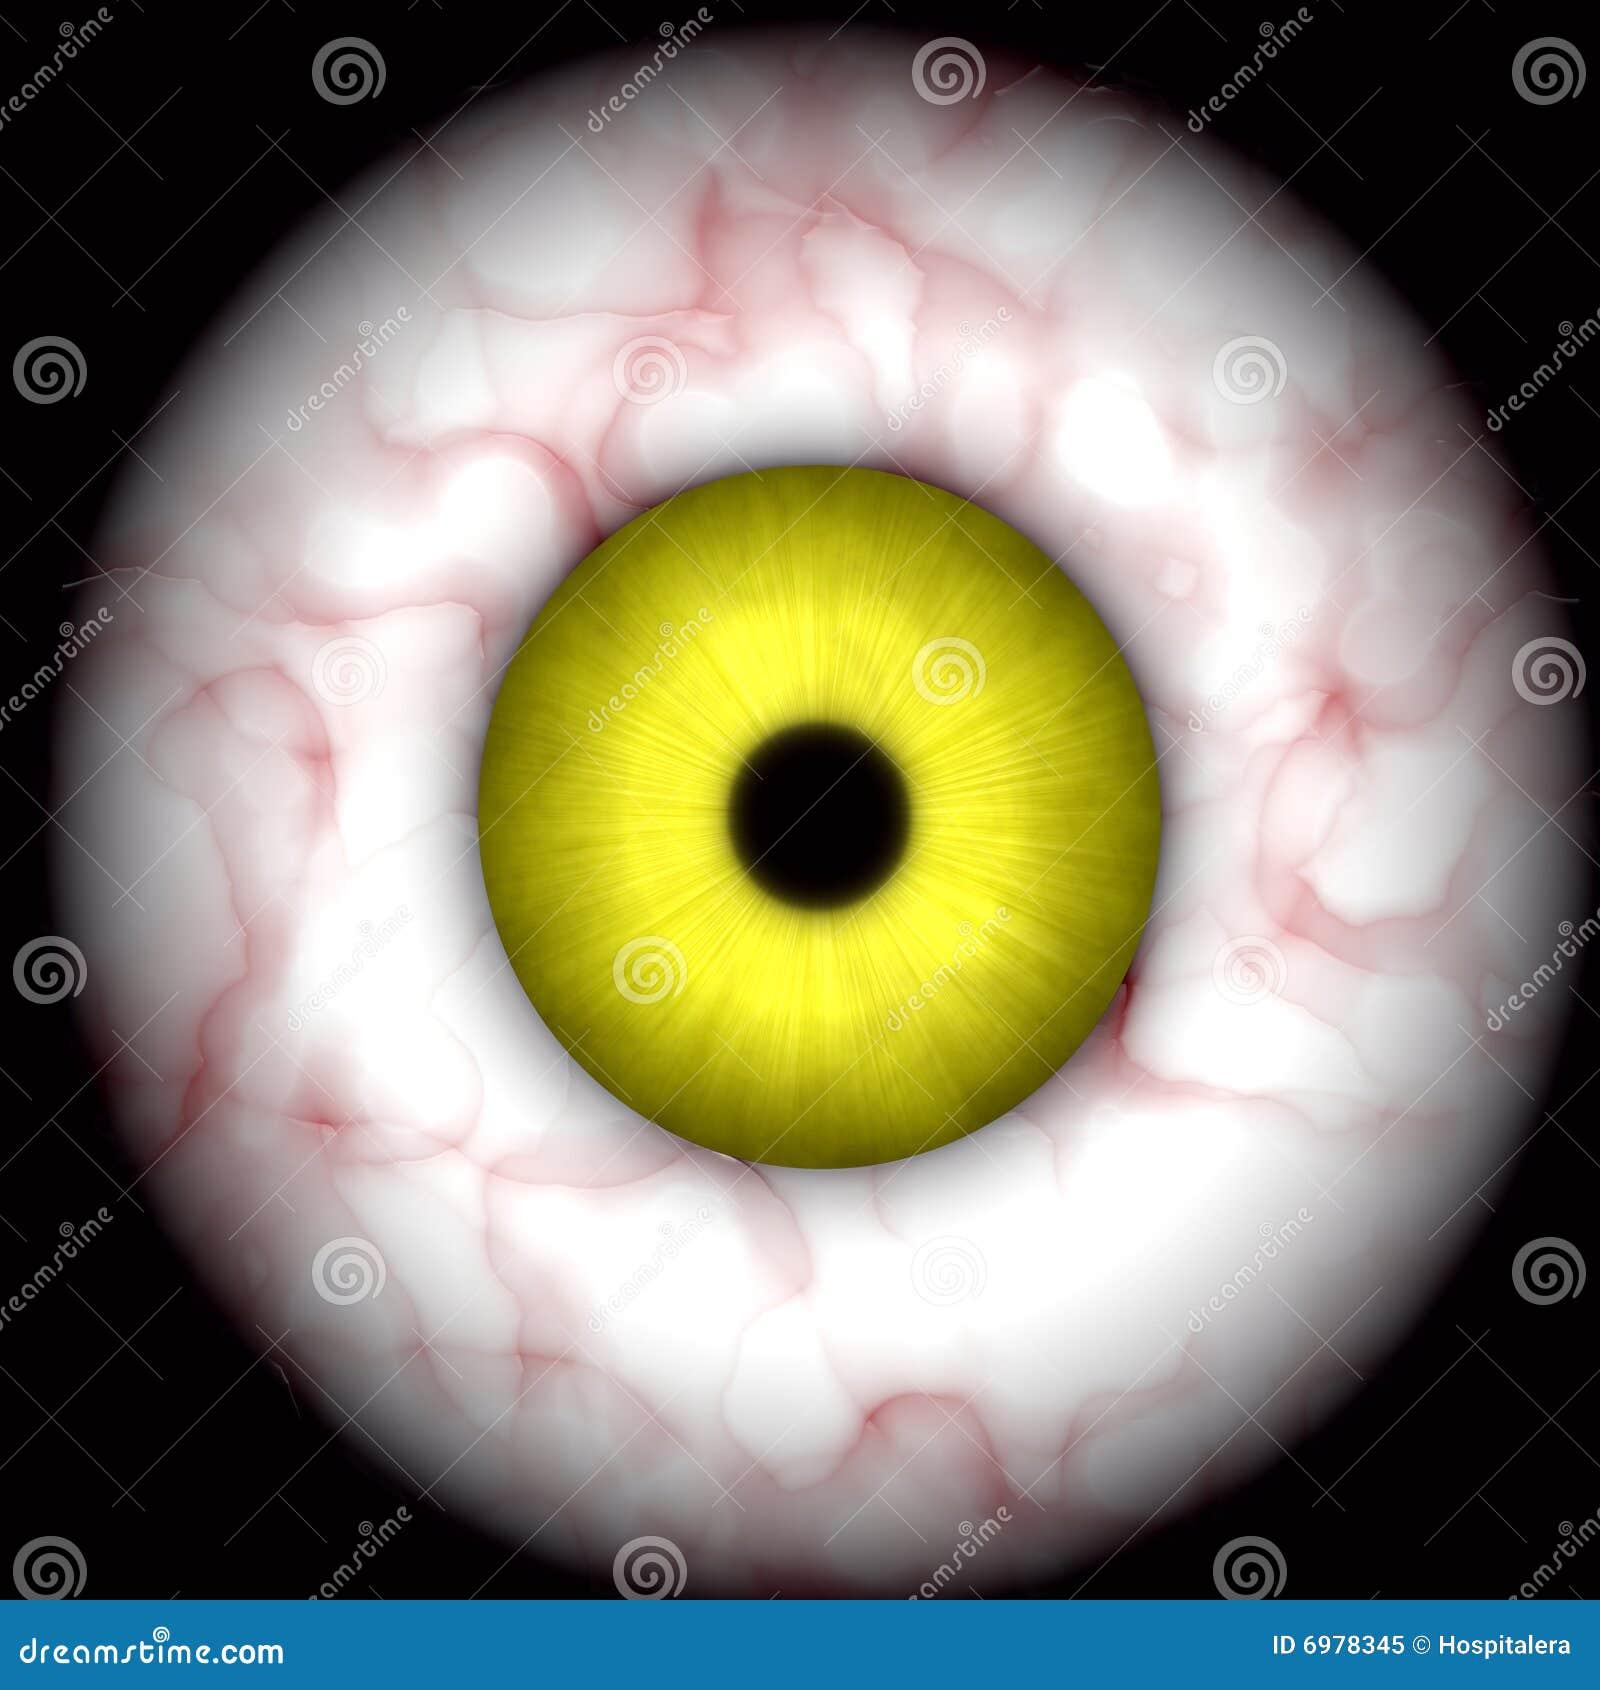 Creepy halloween eye 2 stock image image of human detail - Scary yellow eyes ...